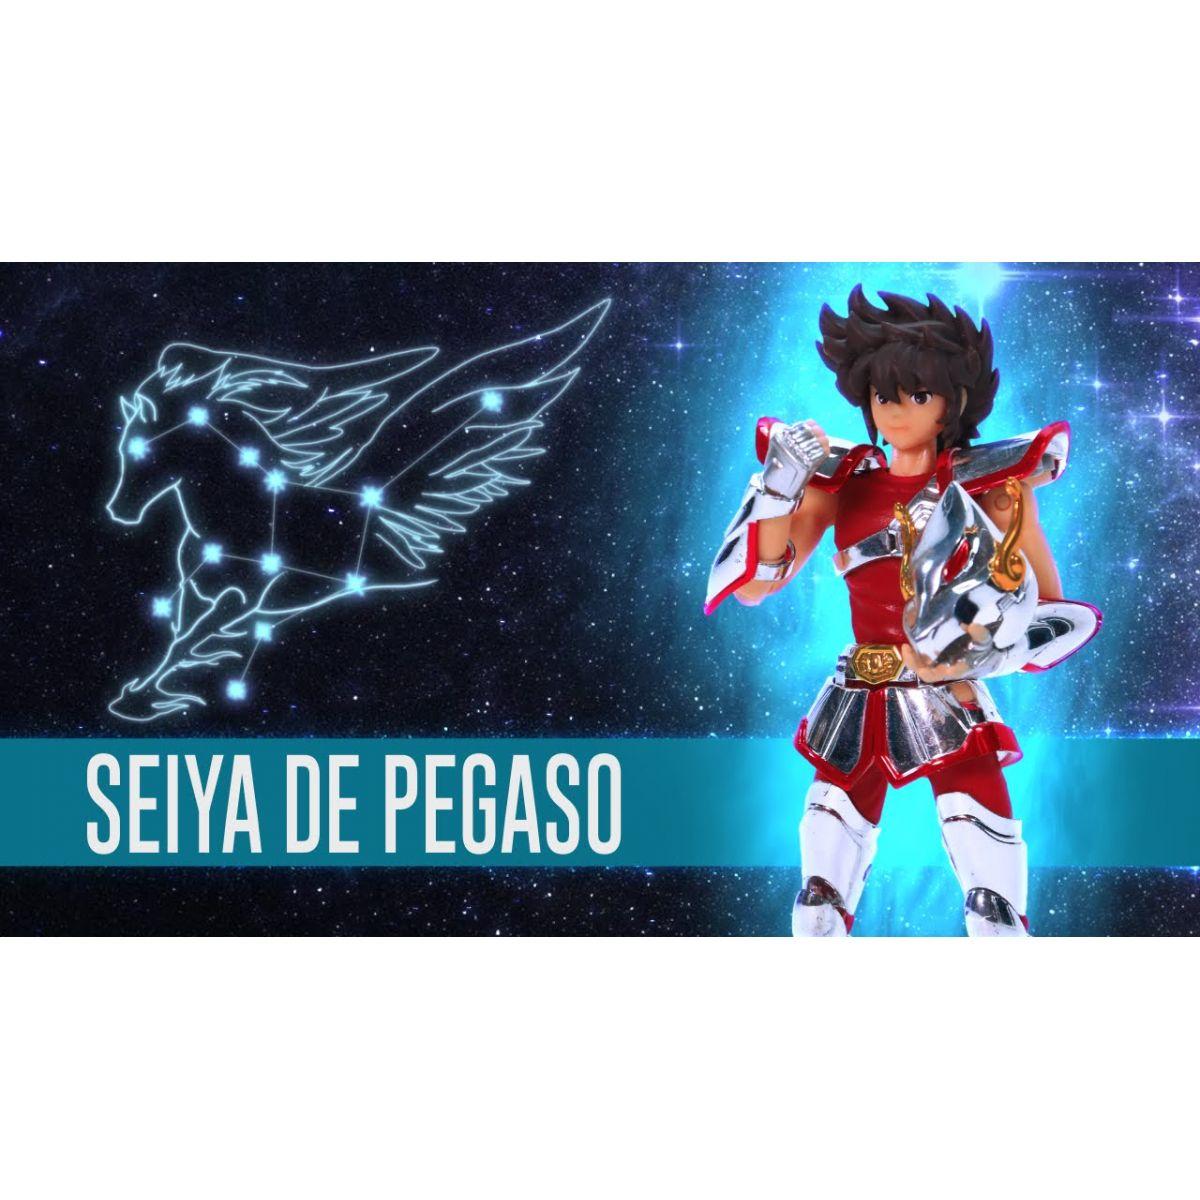 (Os Cavaleiros do Zodíaco) Saint Seiya Pegasus Seiya DD Panoramation - Bandai